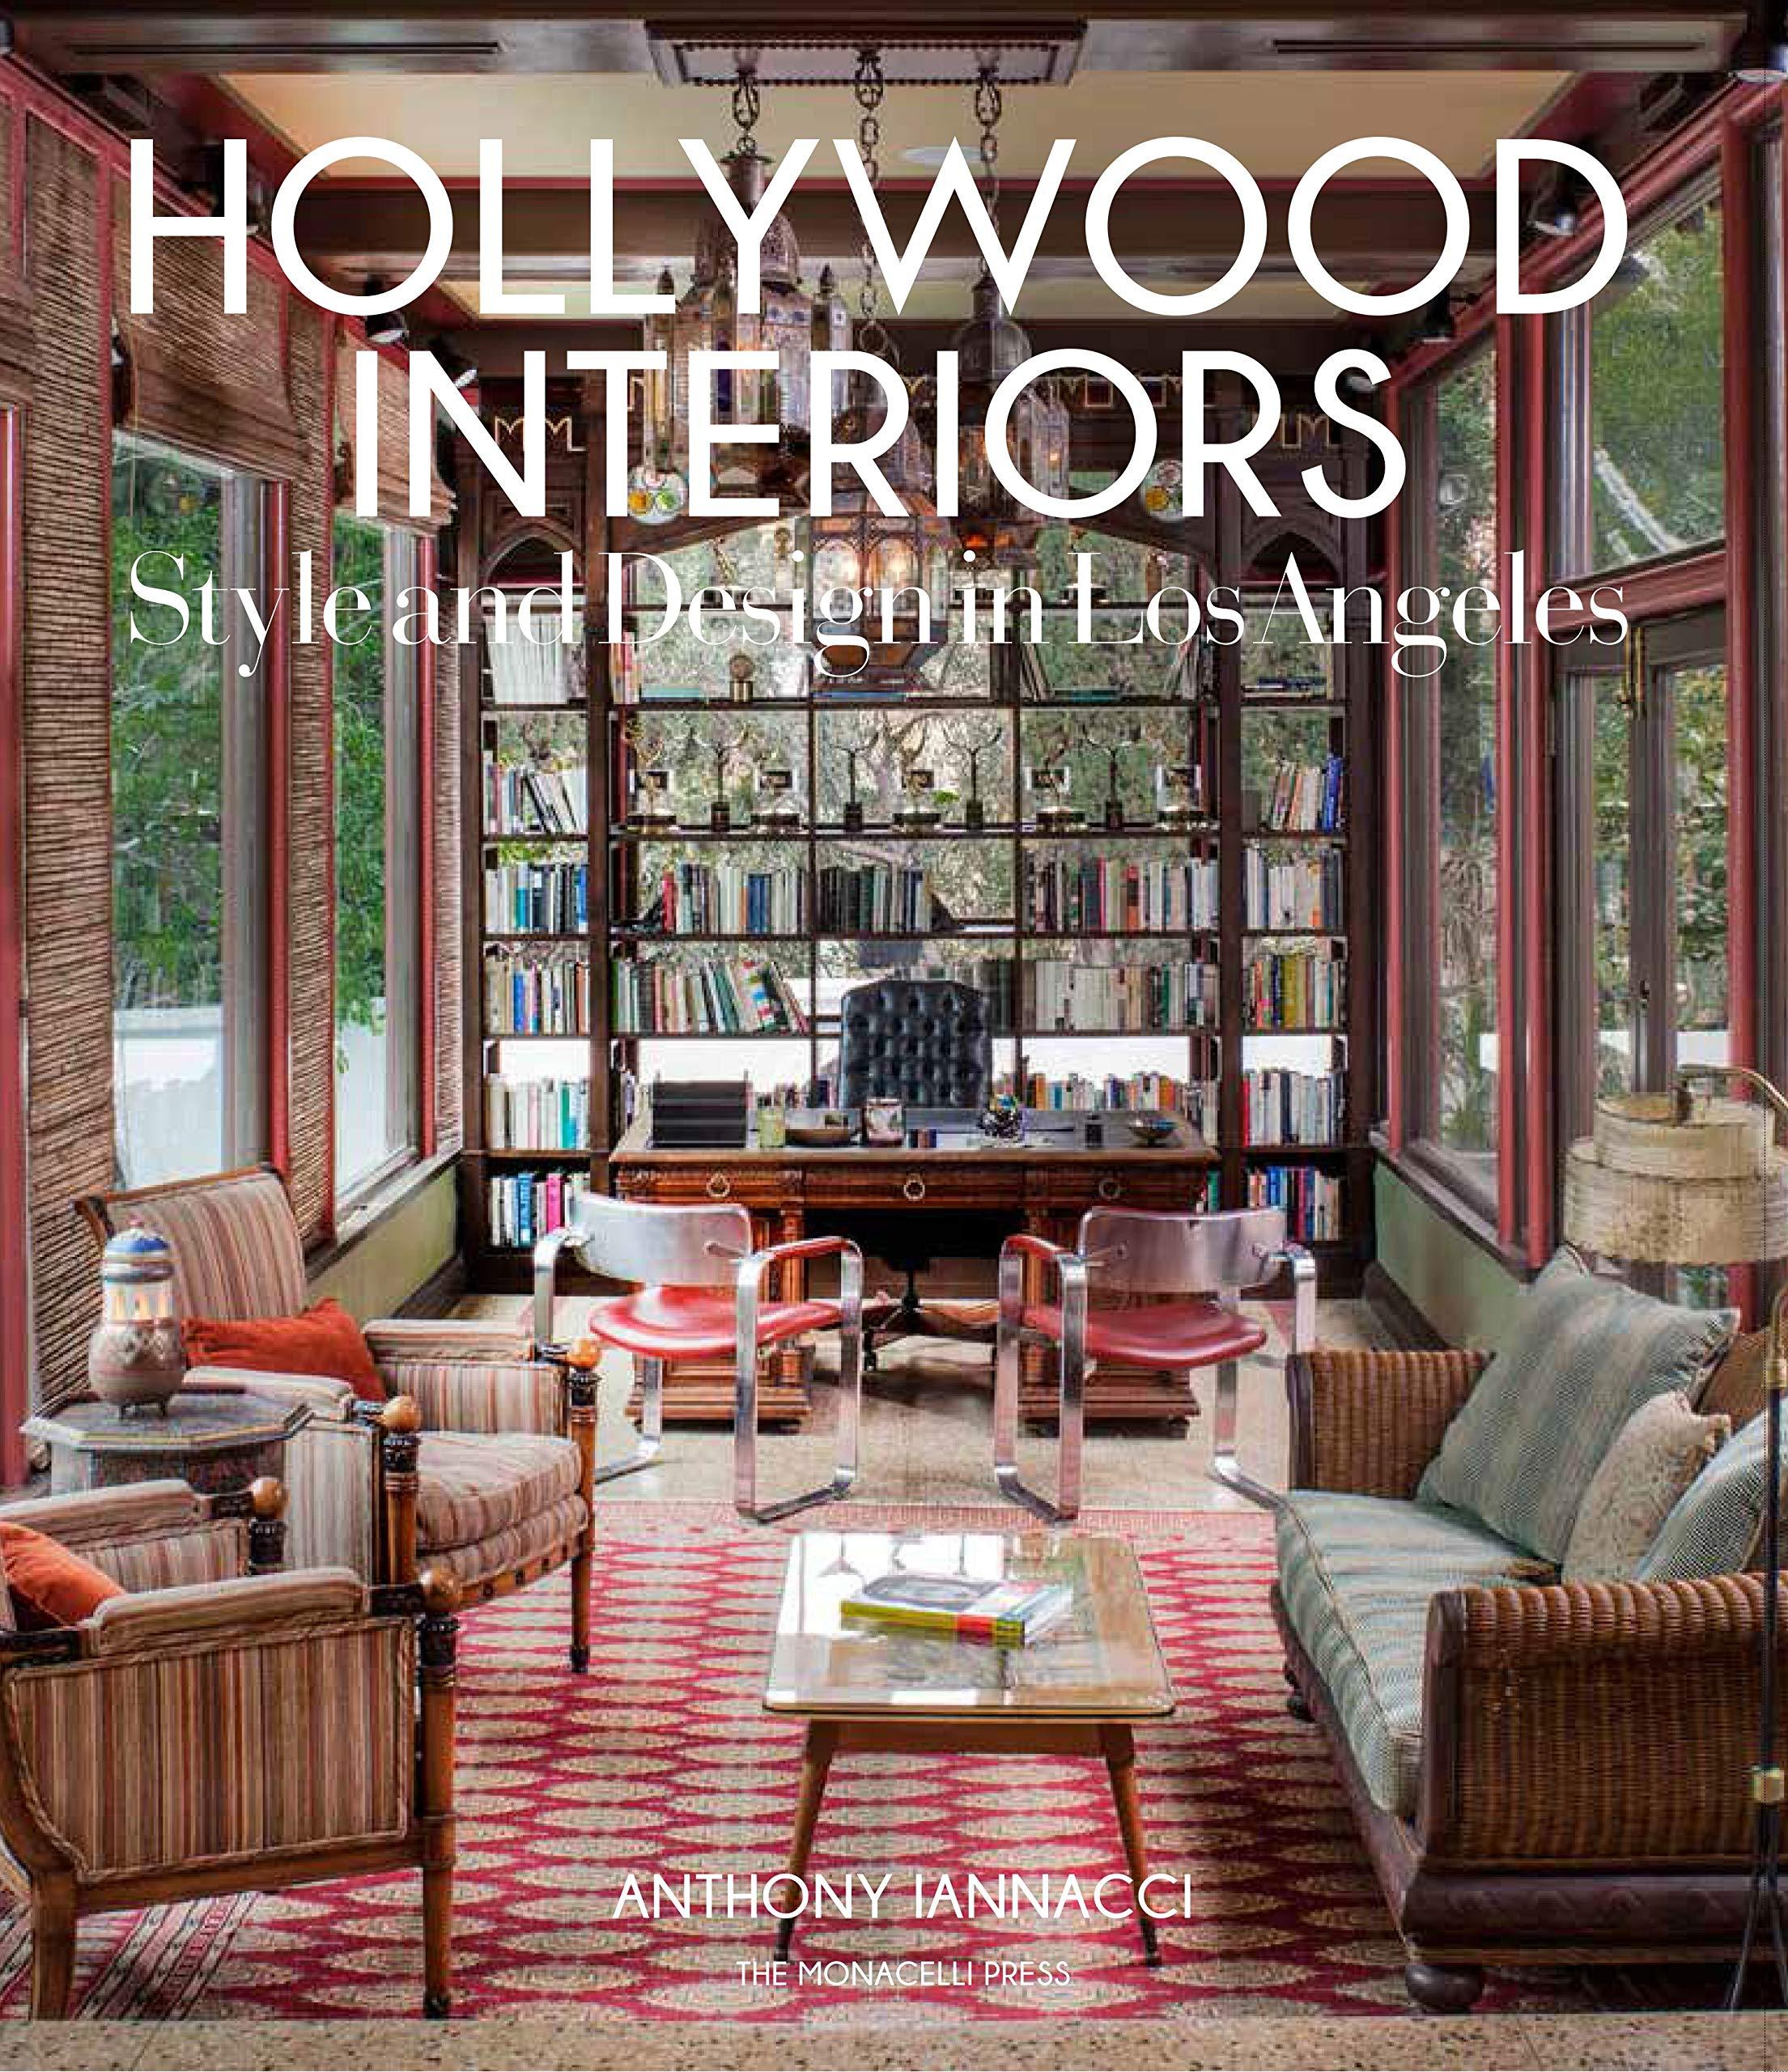 Hollywood Interiors Style And Design In Los Angeles Iannacci Anthony 9781580934169 Amazon Com Books